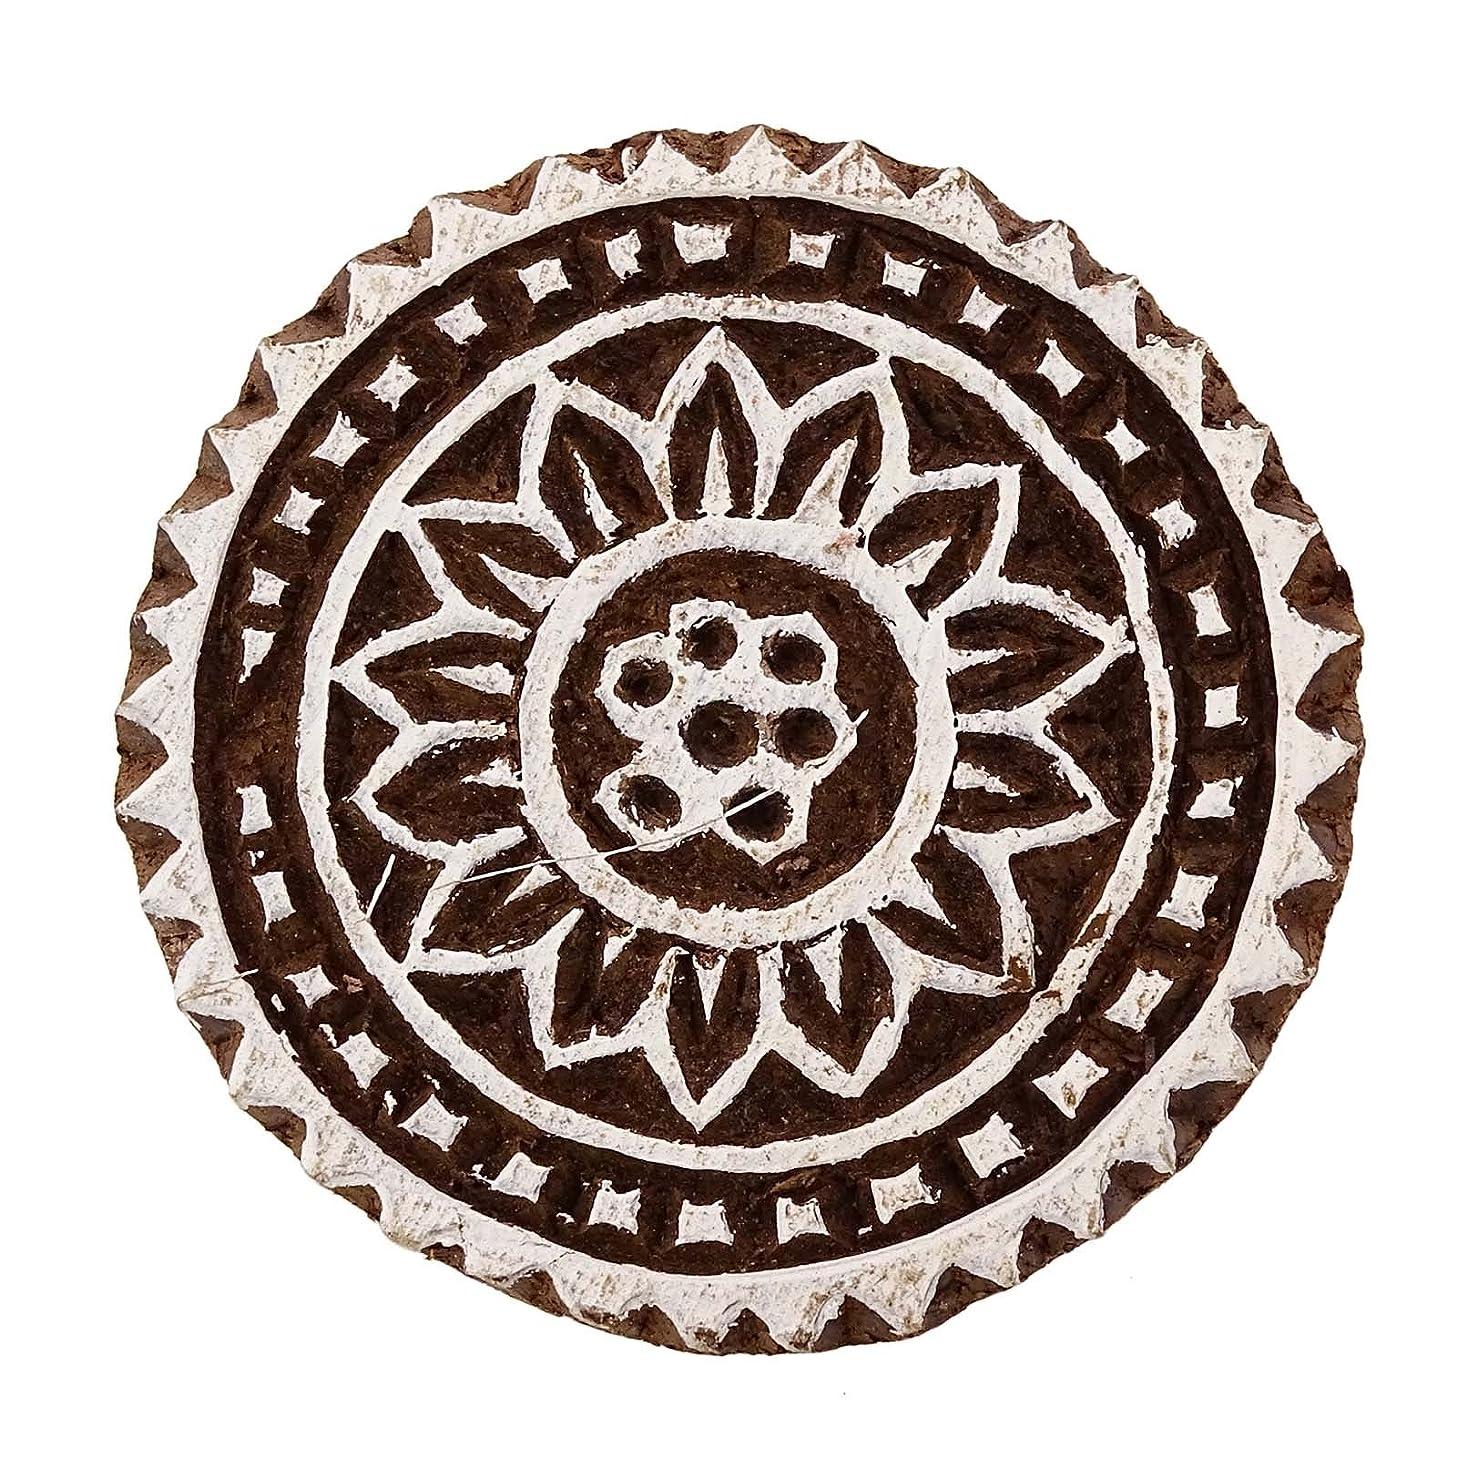 Floral Stamp Block Print Hand Carved Printing Block Brown Wooden Textile Stamp